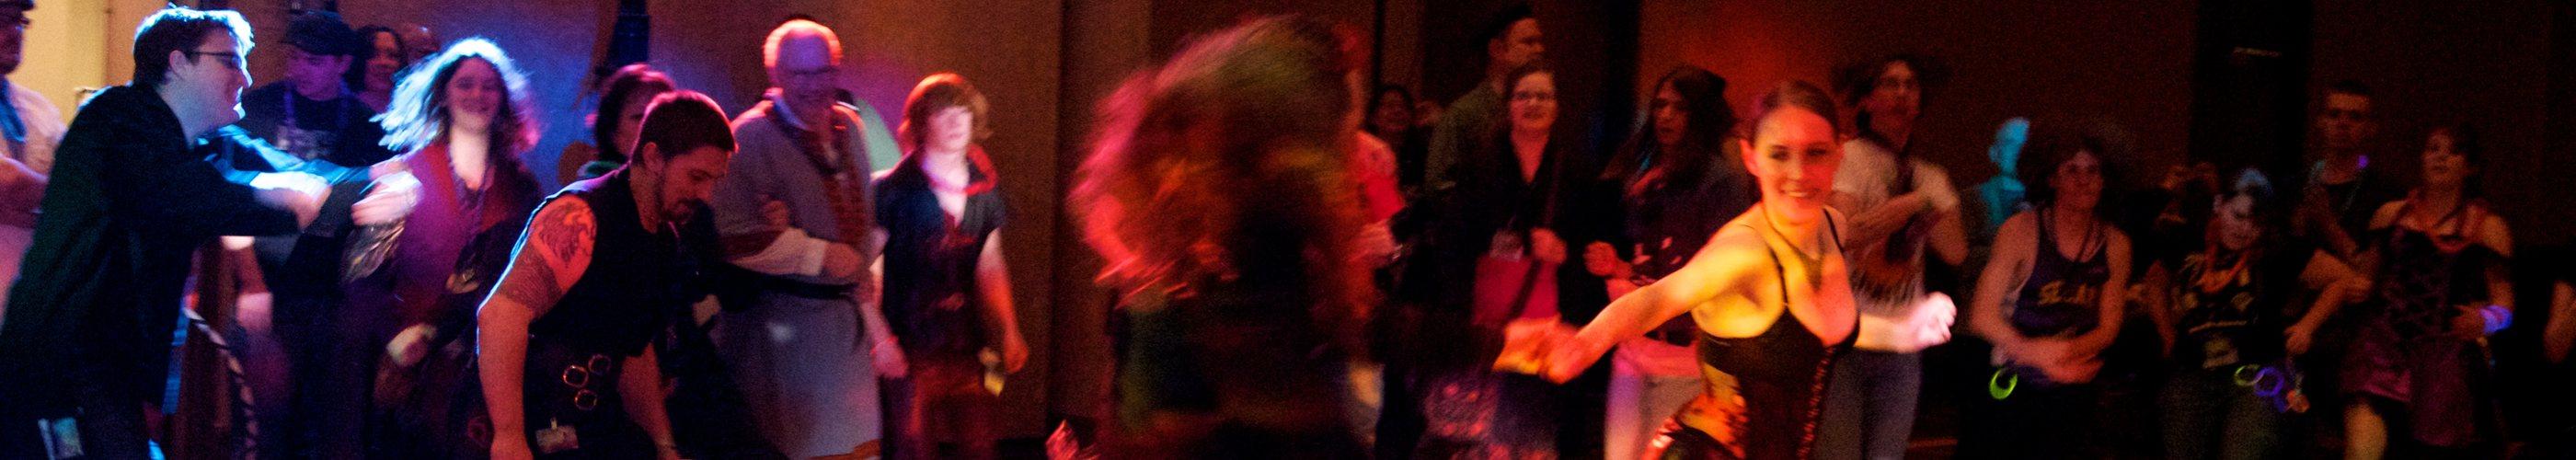 Dances at Norwescon